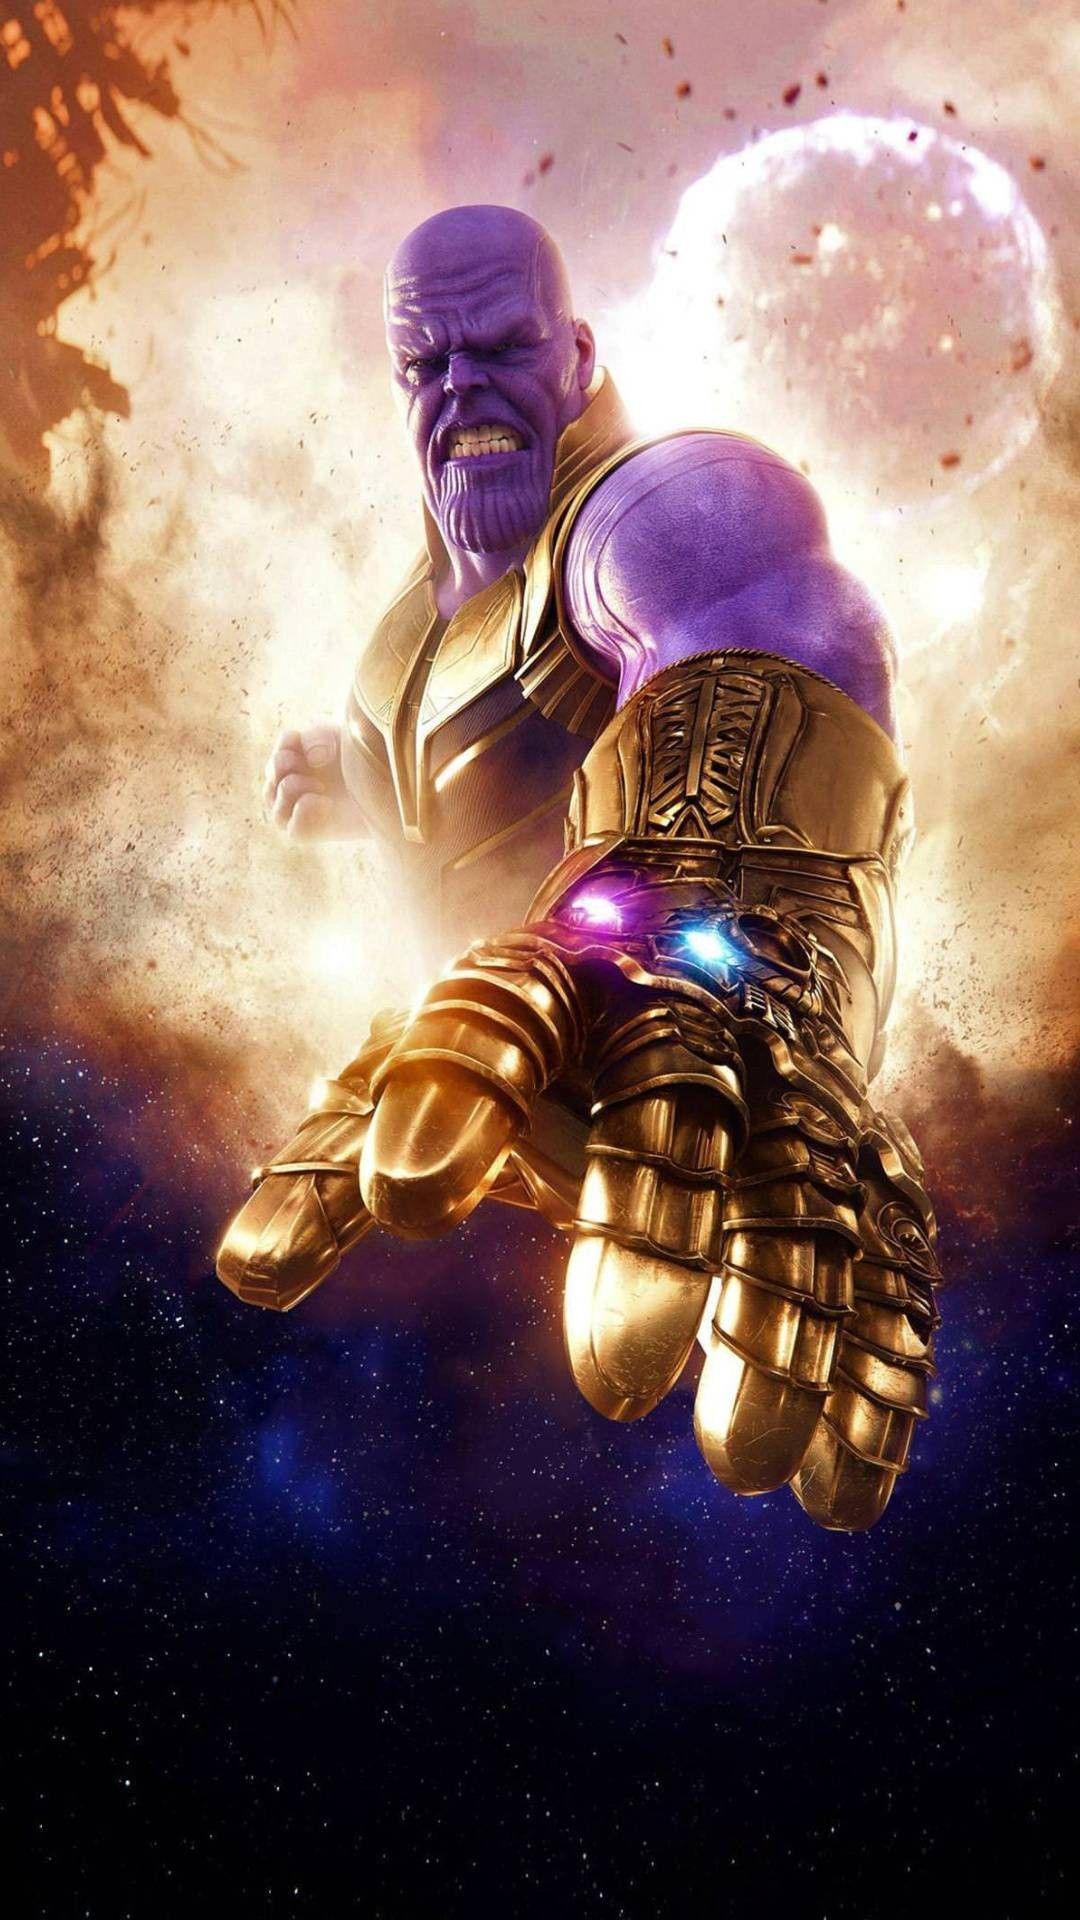 Pin De Anthony Bukhanystyy En Villians Dibujos Marvel Heroes Marvel Marvel